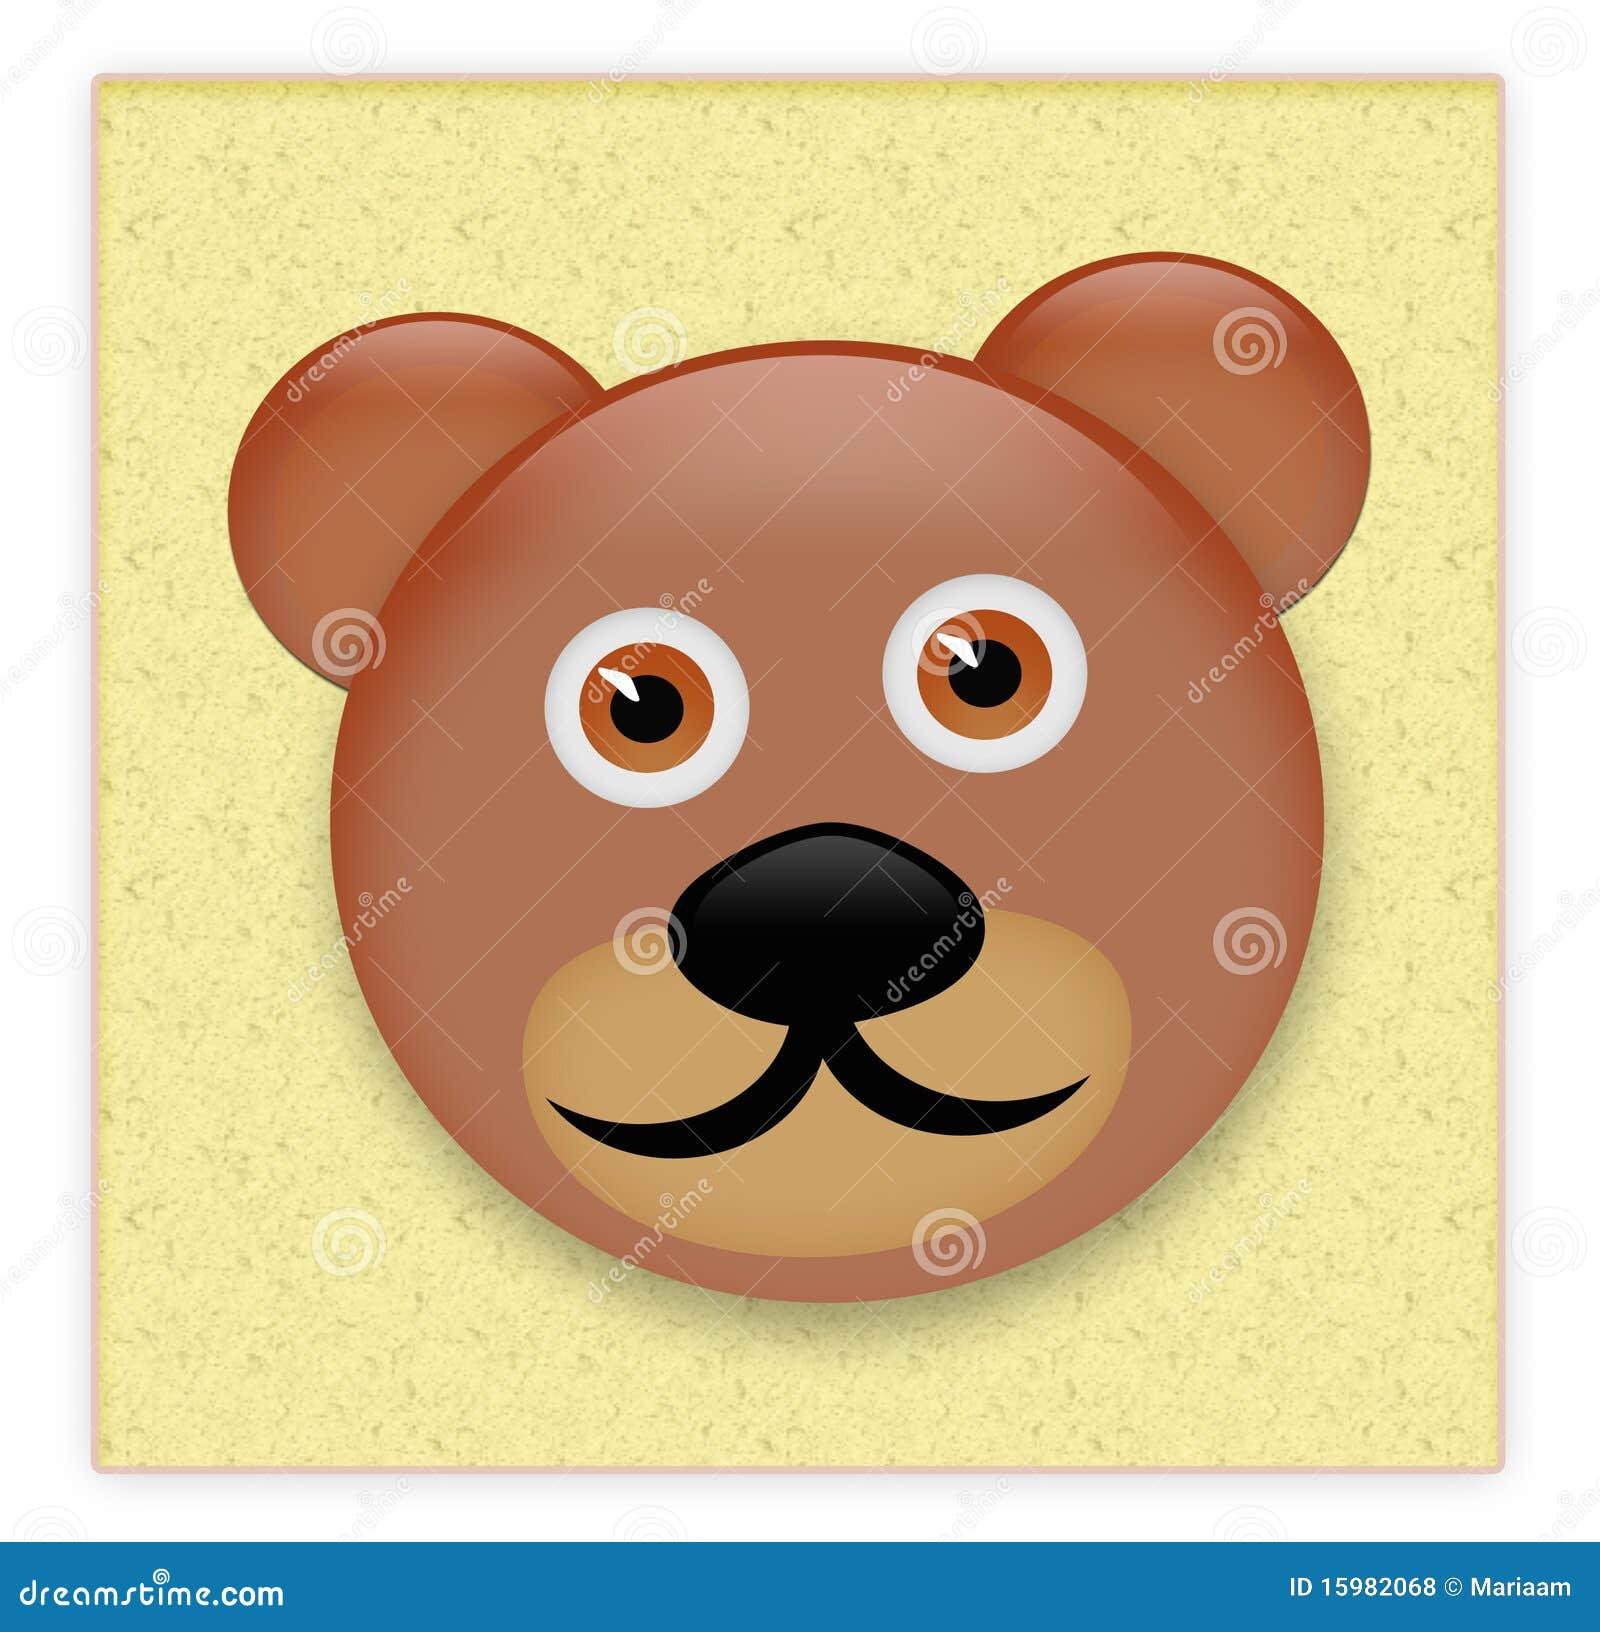 teddy bear sticker stock vector illustration of object 23465012